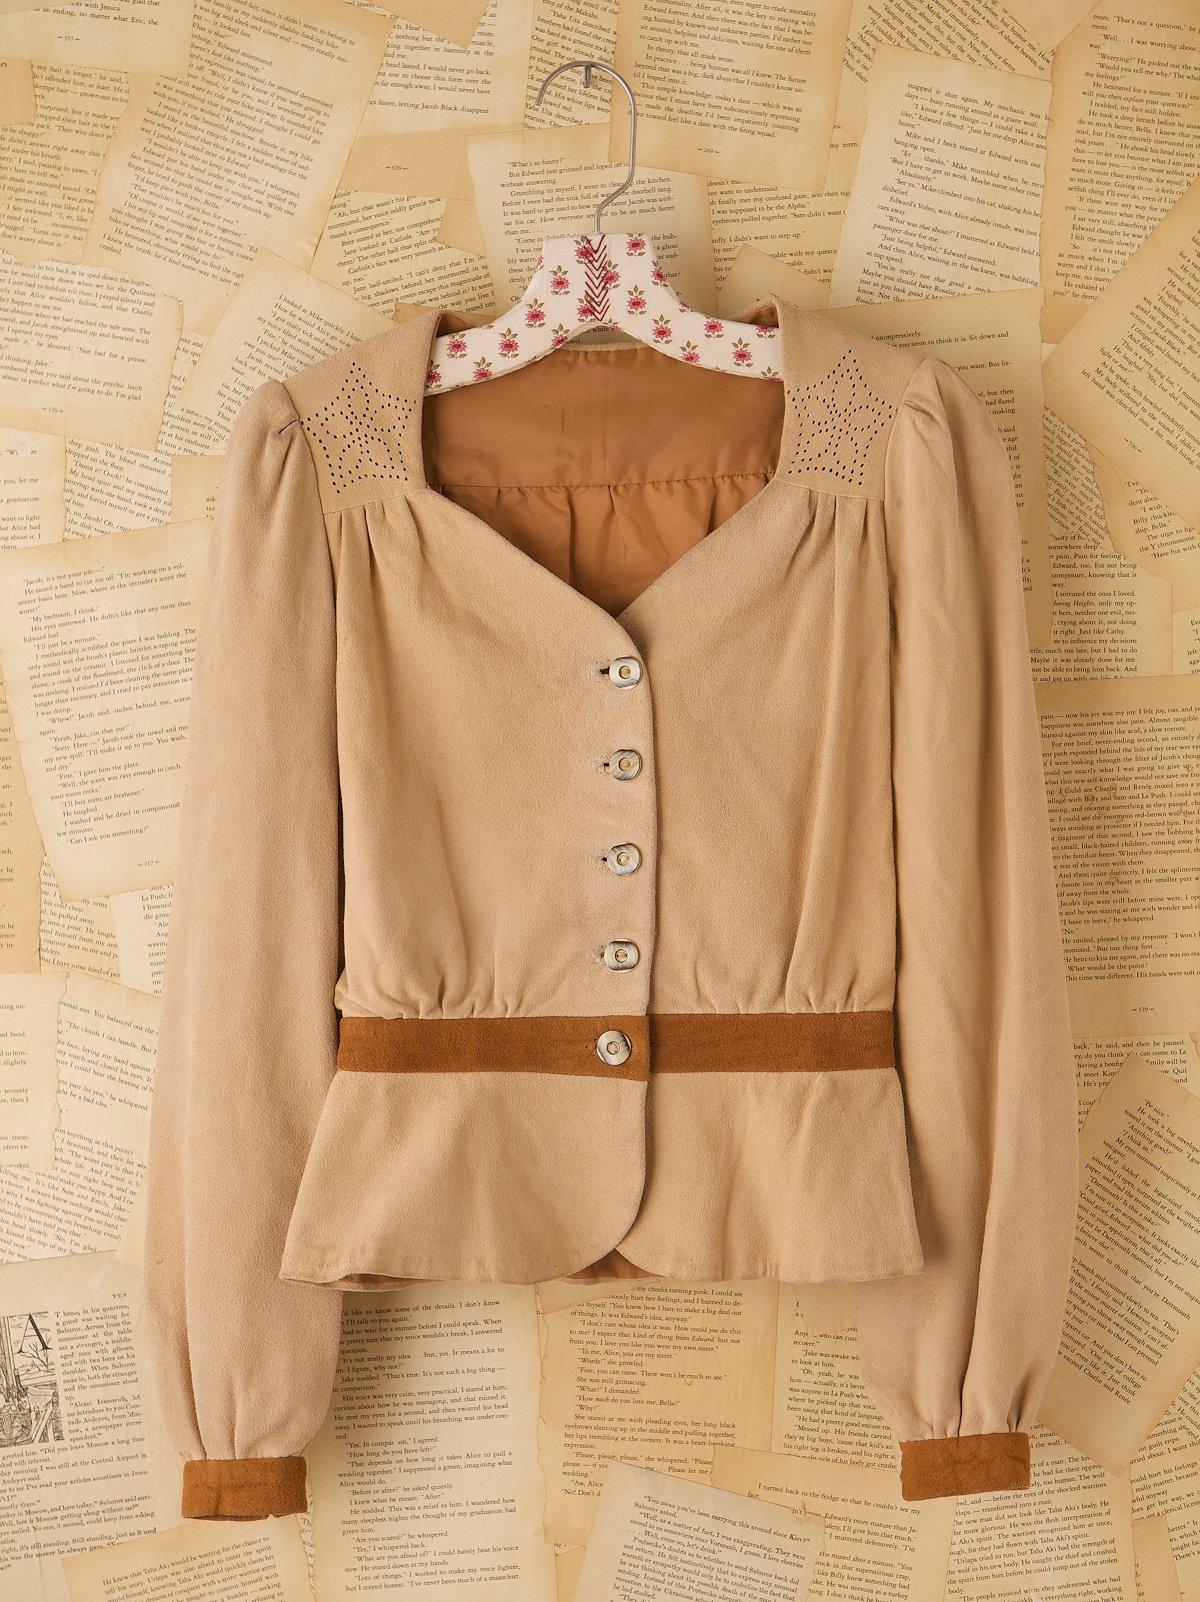 Vintage 1970s Suede Jacket